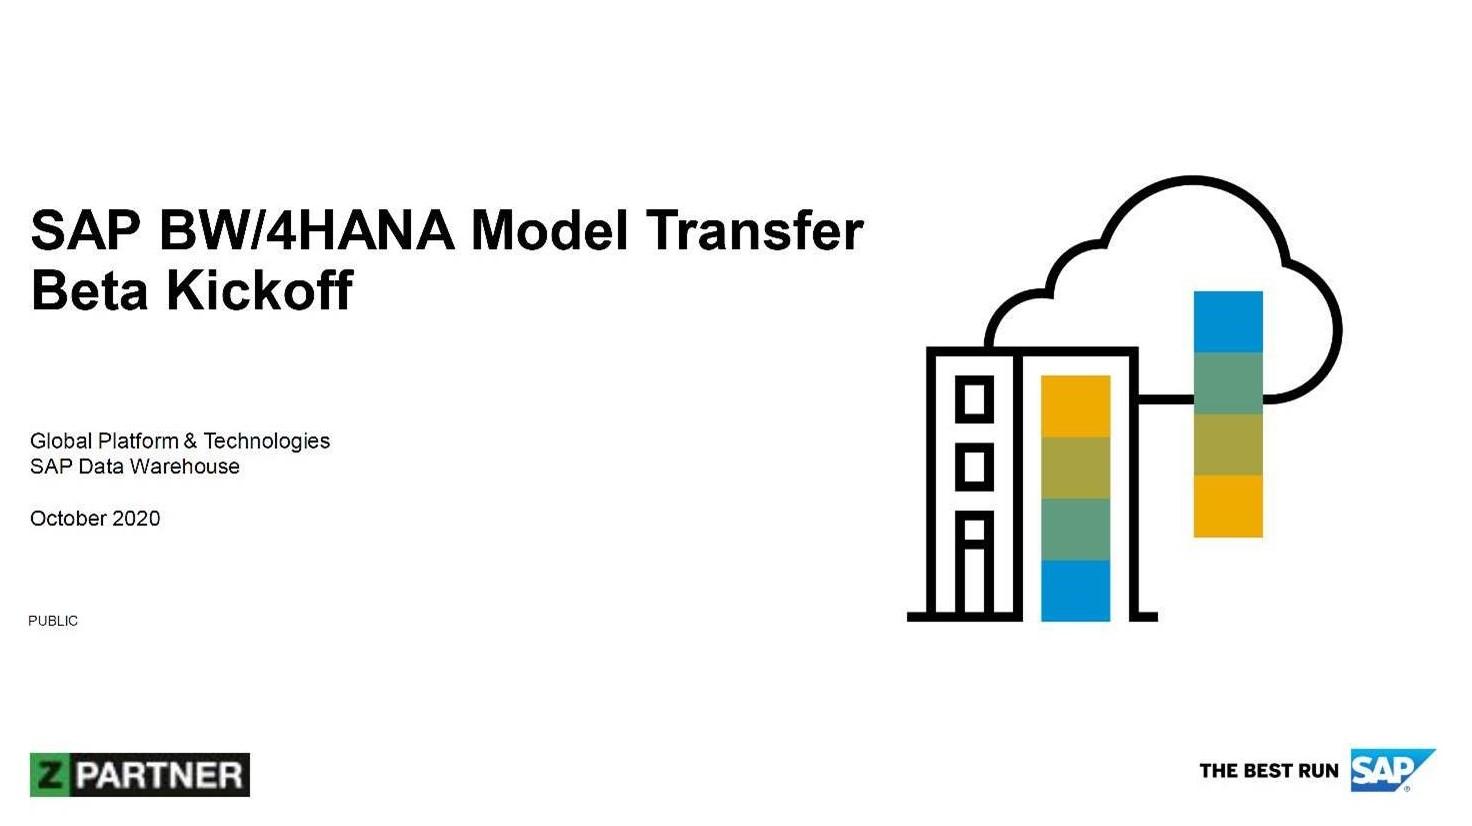 ZPARTNER joins SAP Betaprogramm. Ein Beta Kickoff mit SAP BW/4HANA.